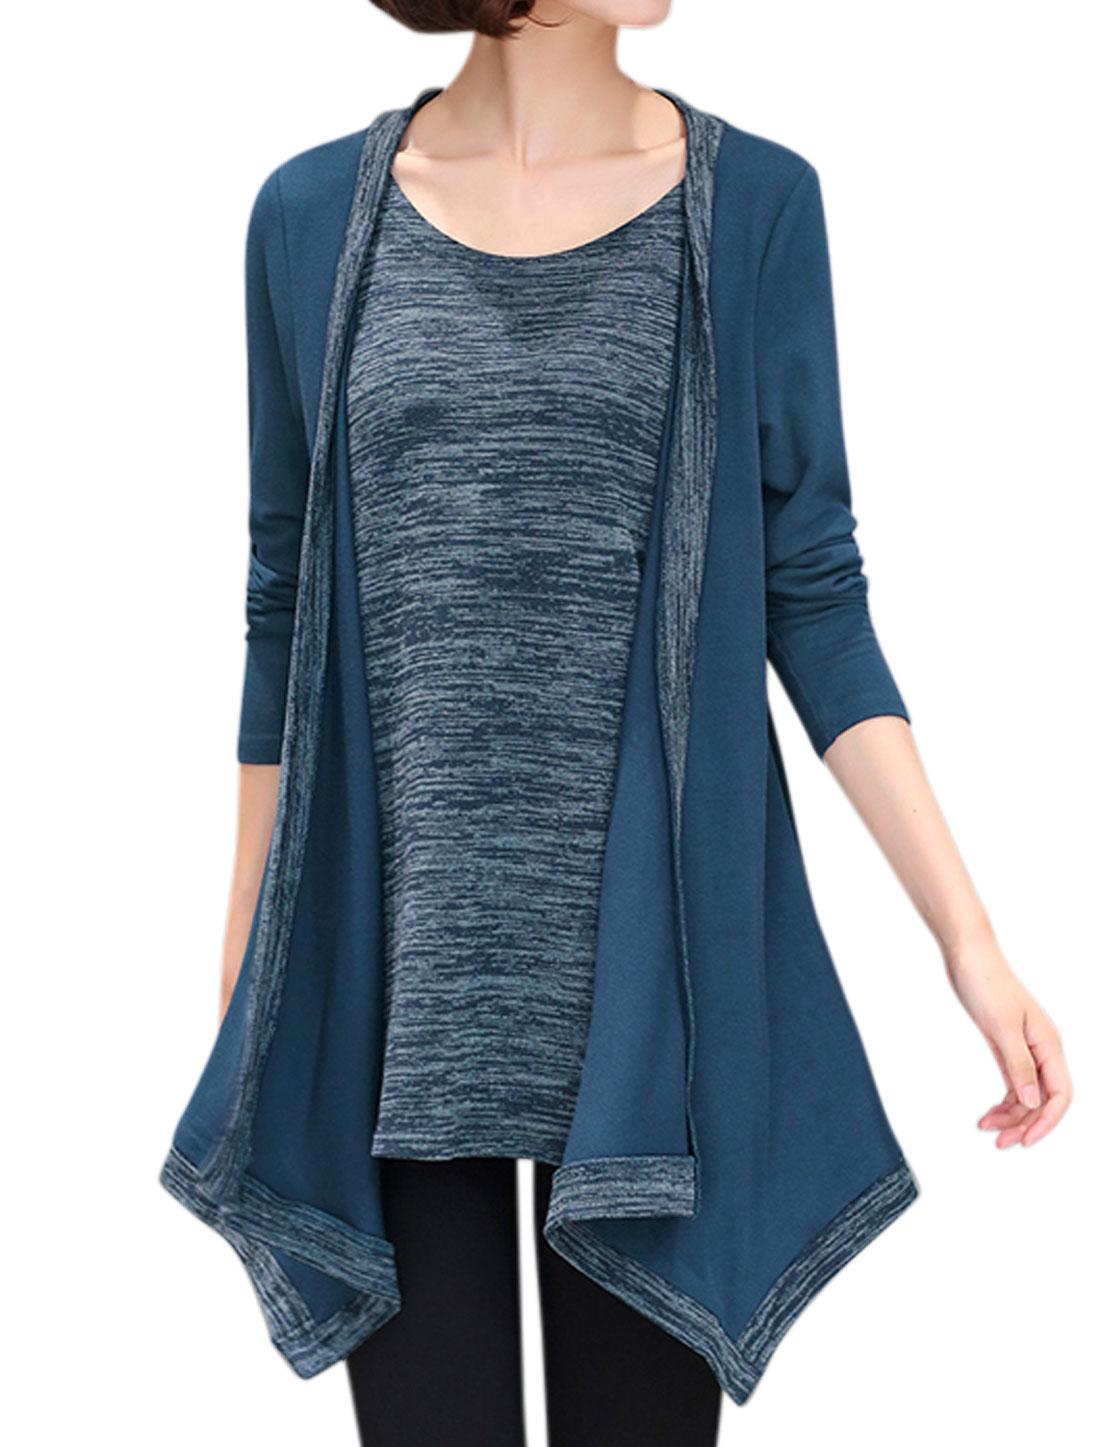 Women Long Sleeves Space Dye Asymmetric Hem Tunic Layered Top Blue S